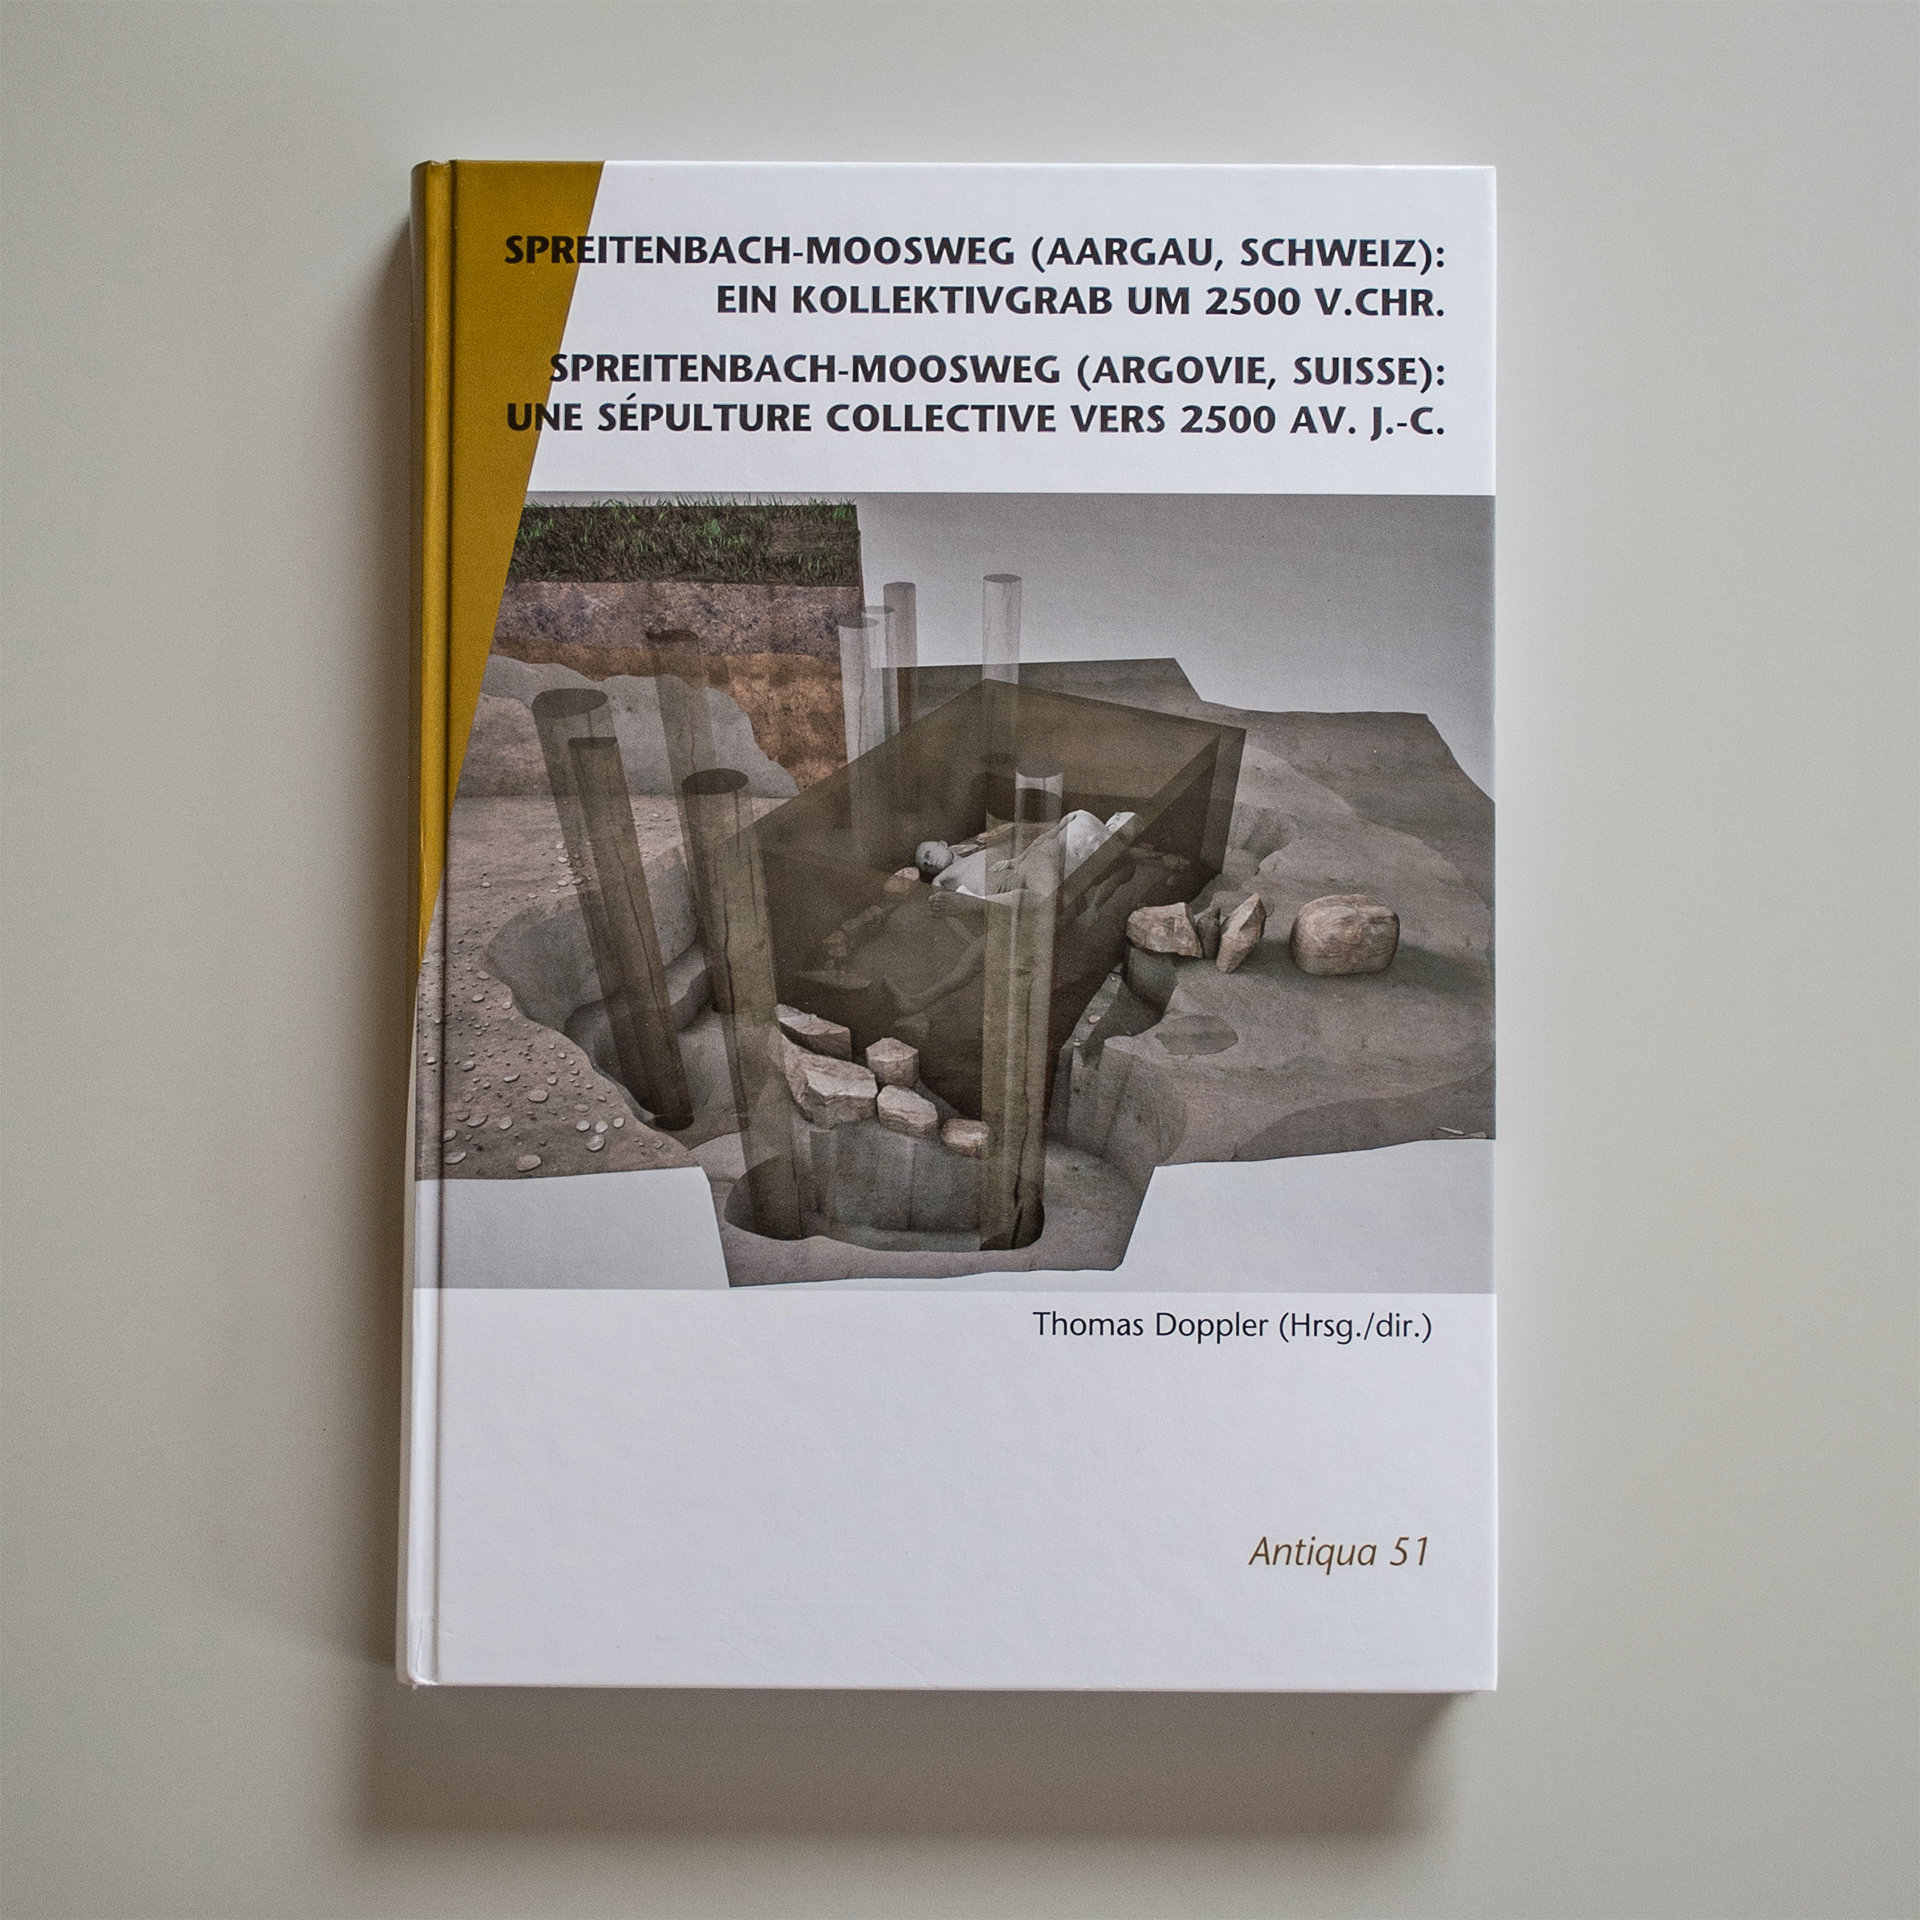 Spreitenbach Moosweg Publikation, Kollektivgrab, ikonaut